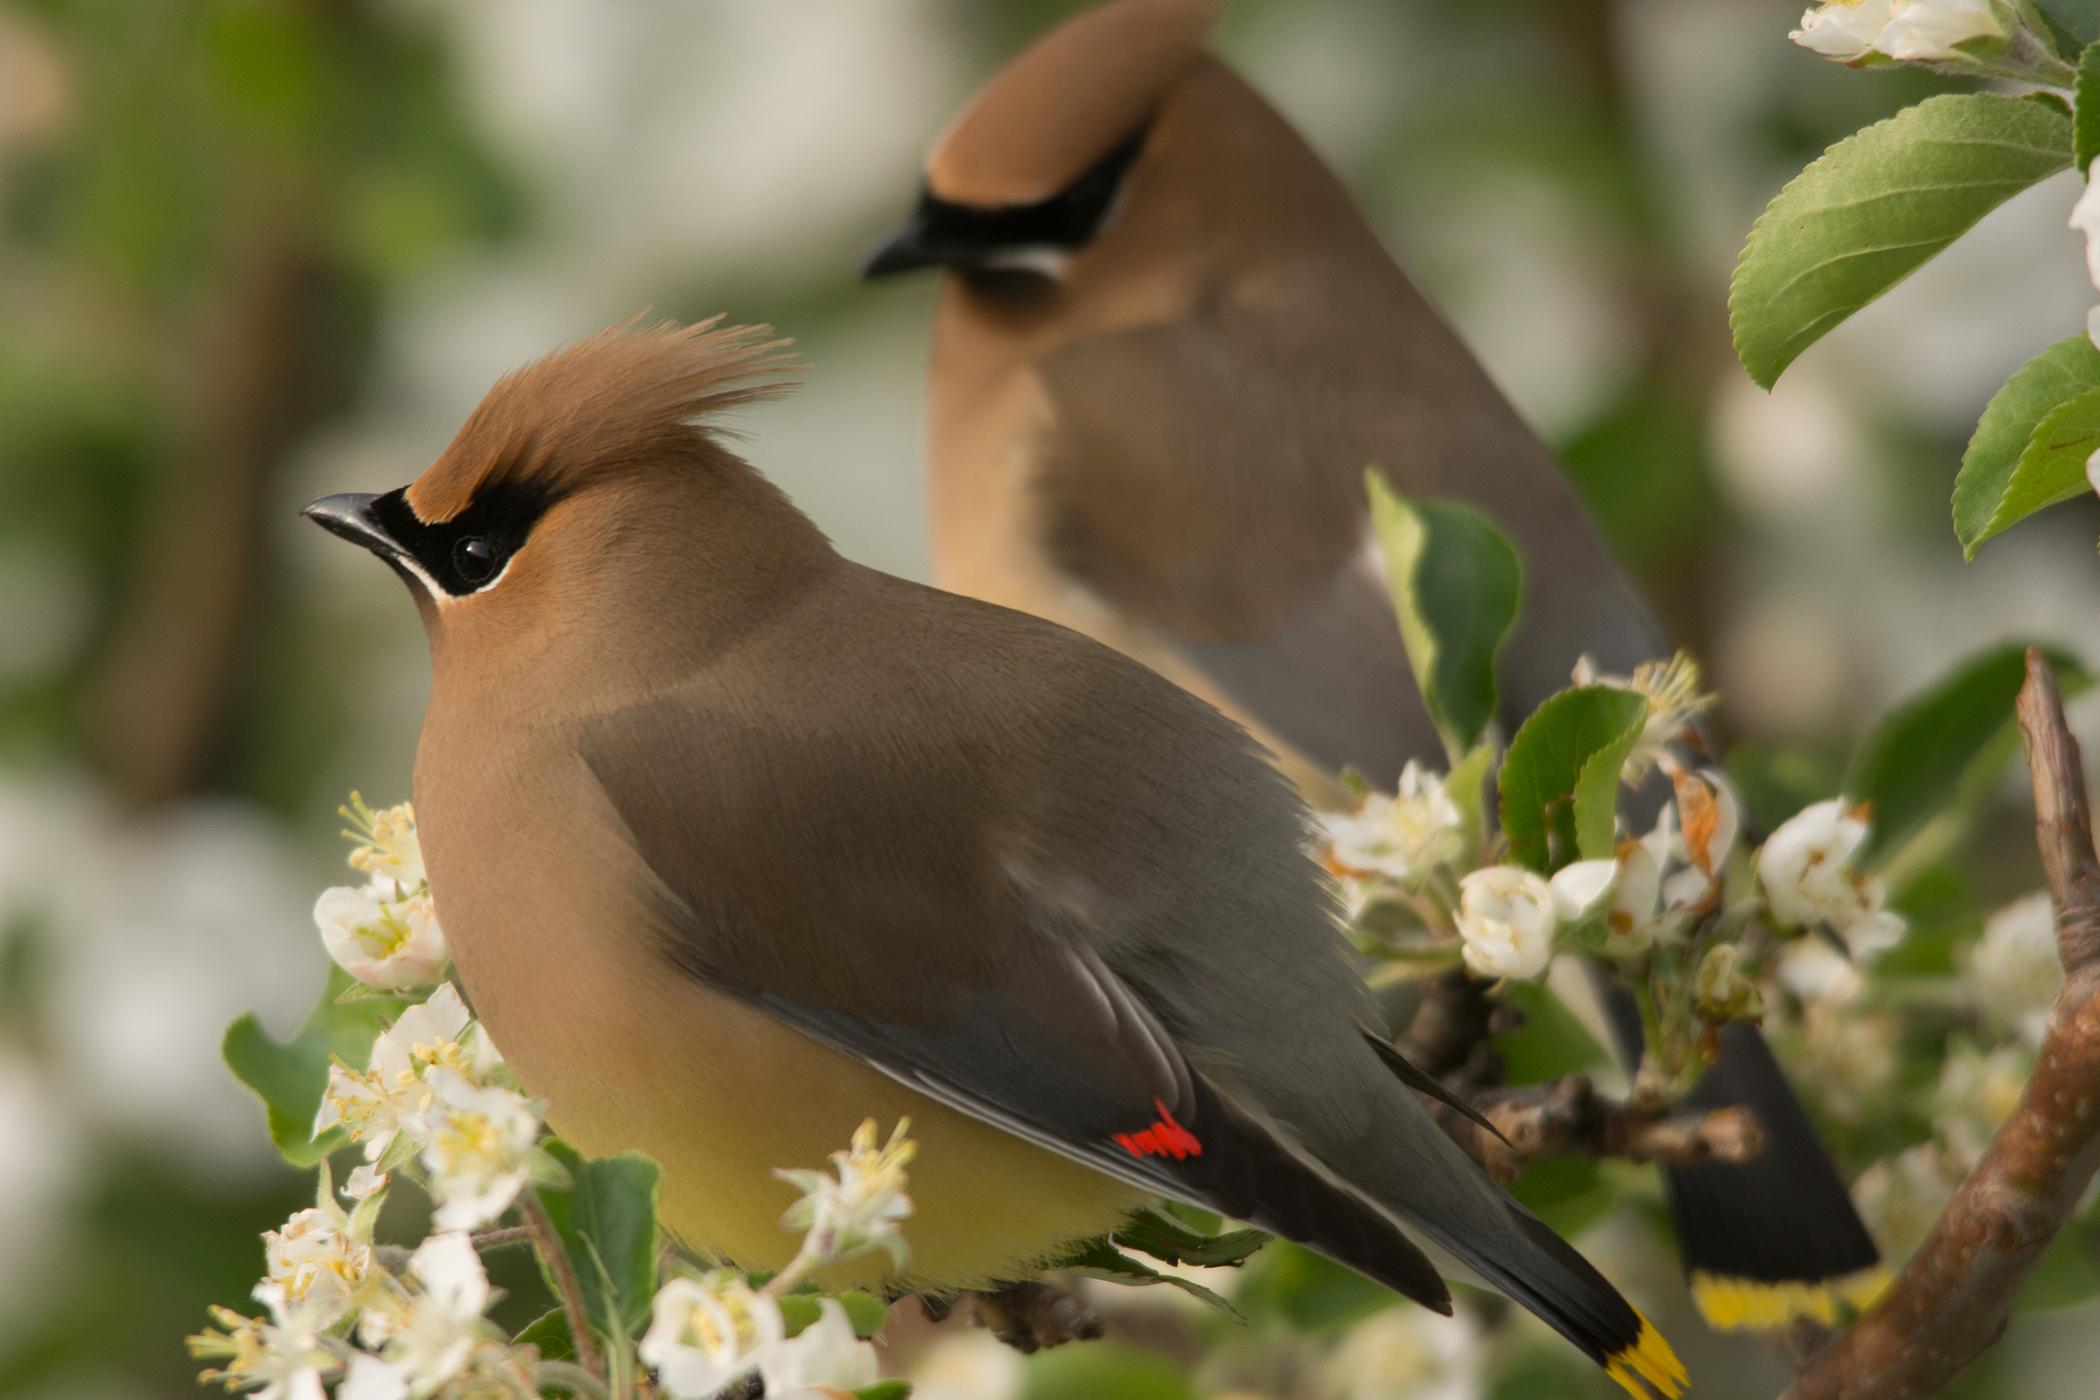 Air Sac Mites in Birds